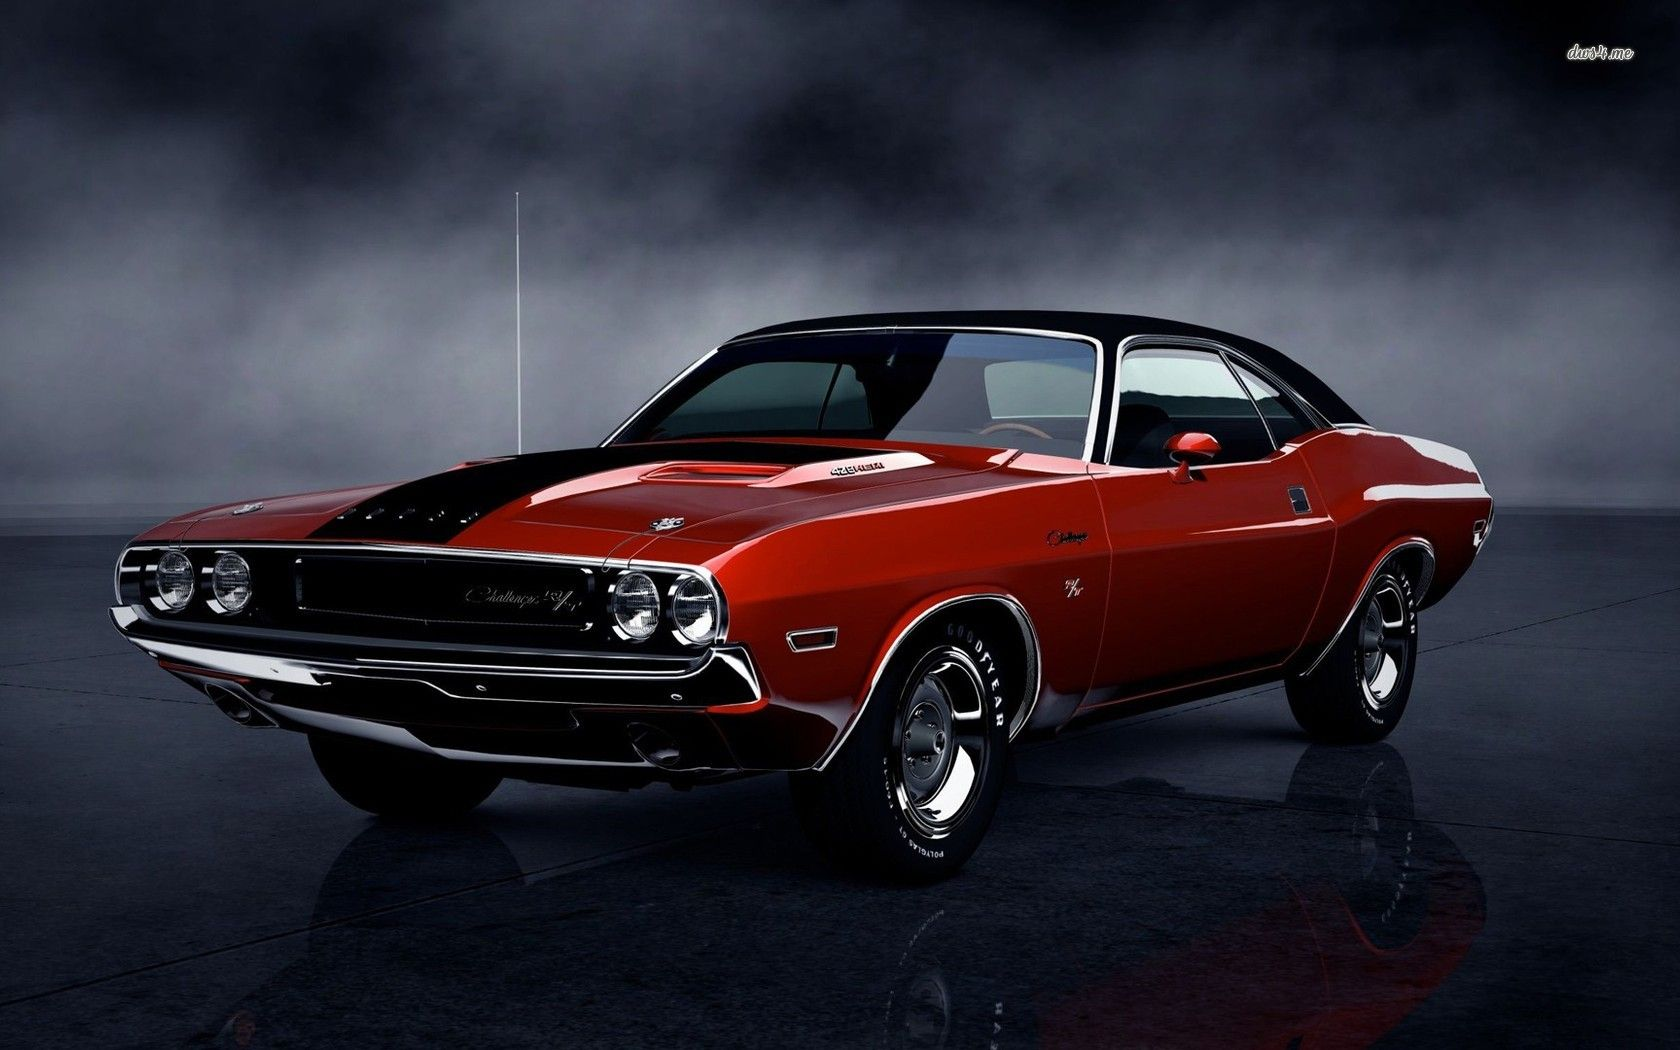 Classic Dodge Challenger Wallpaper 1680x1050 16505 Classic Cars Dodge Challenger Classic Cars Muscle